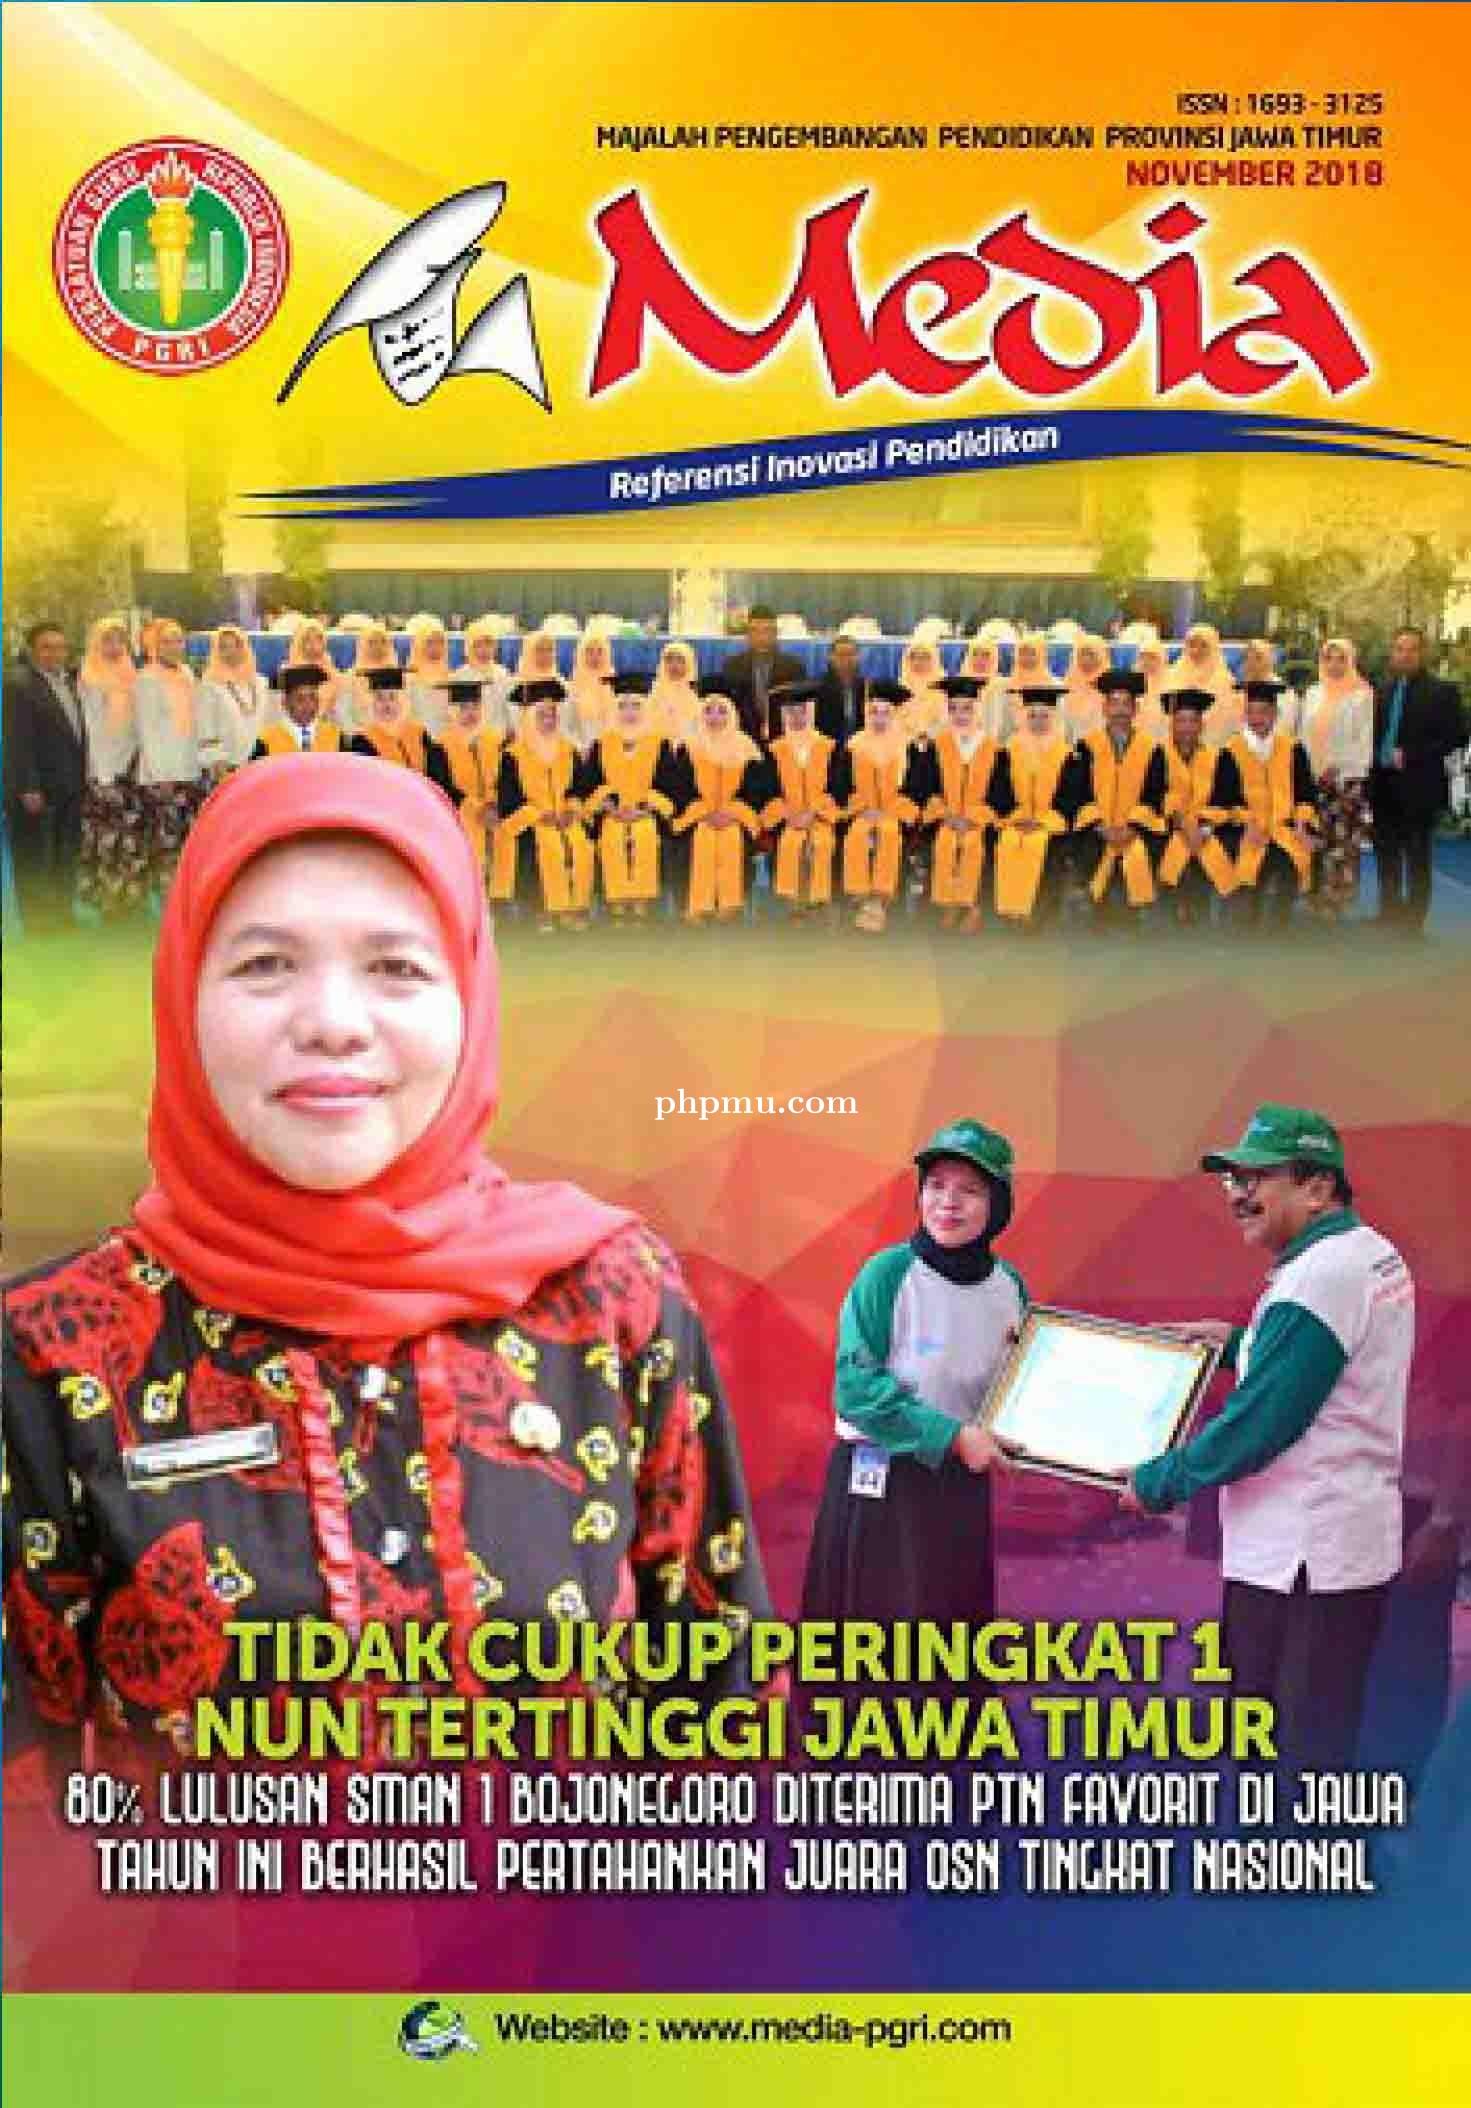 Majalah Media Bulan November 2018